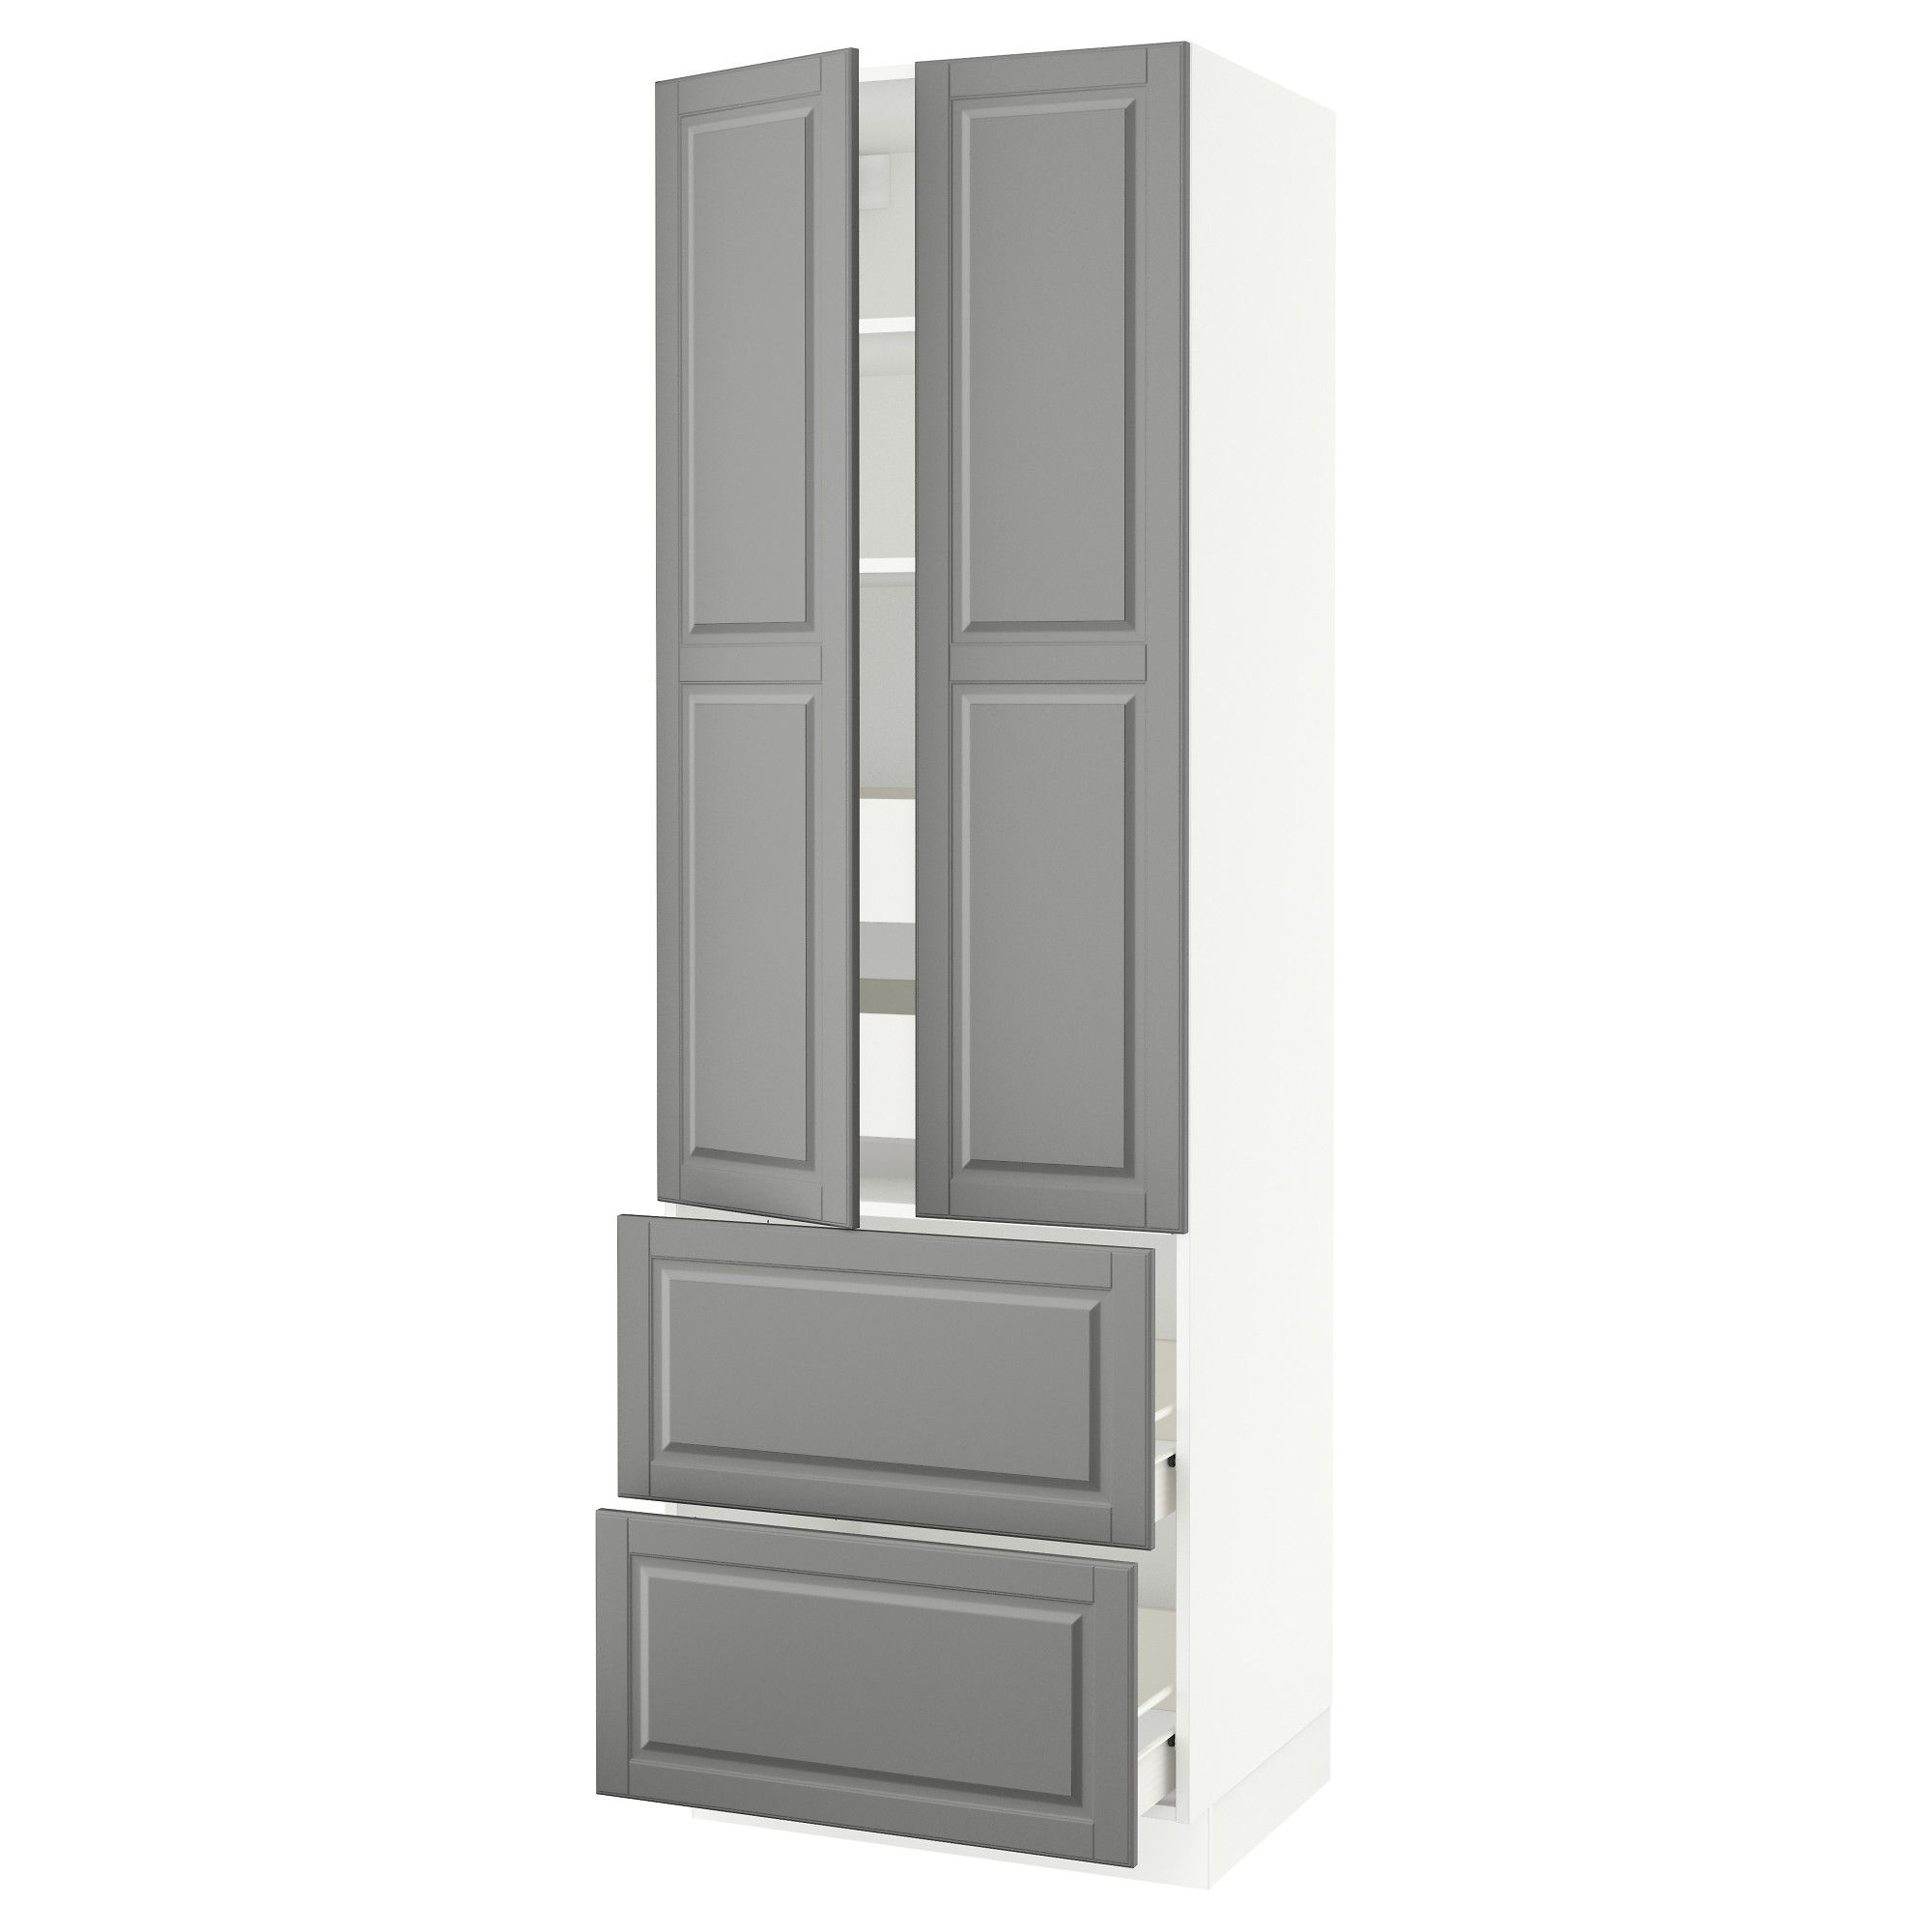 ikea sektion white high cabinet w 2doors 4 drawers frame colour rh pinterest com